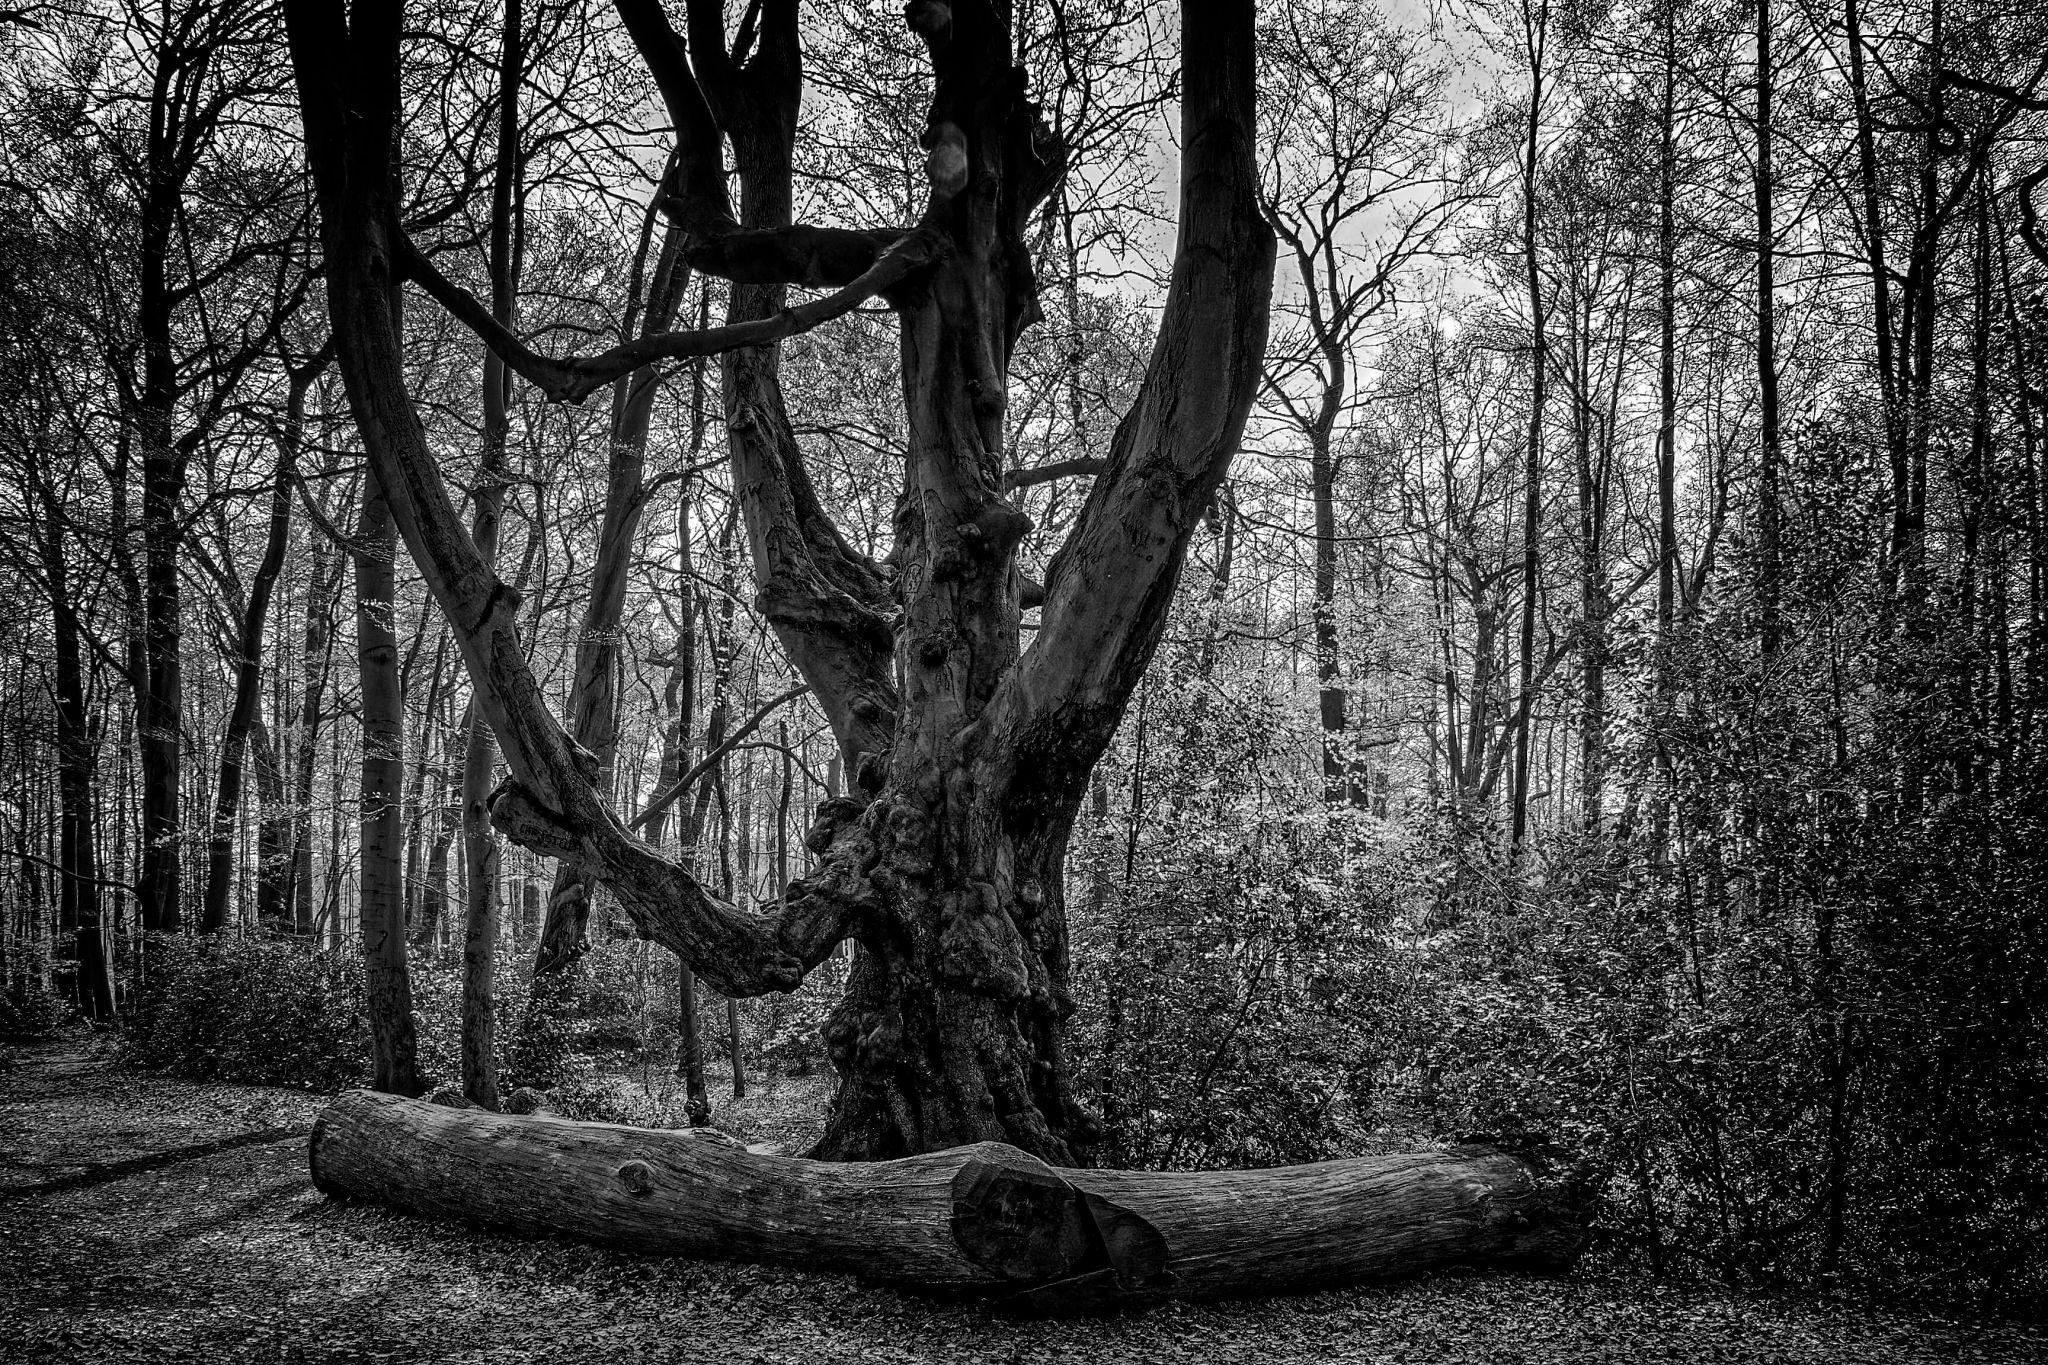 Old Beech Tree, Germany